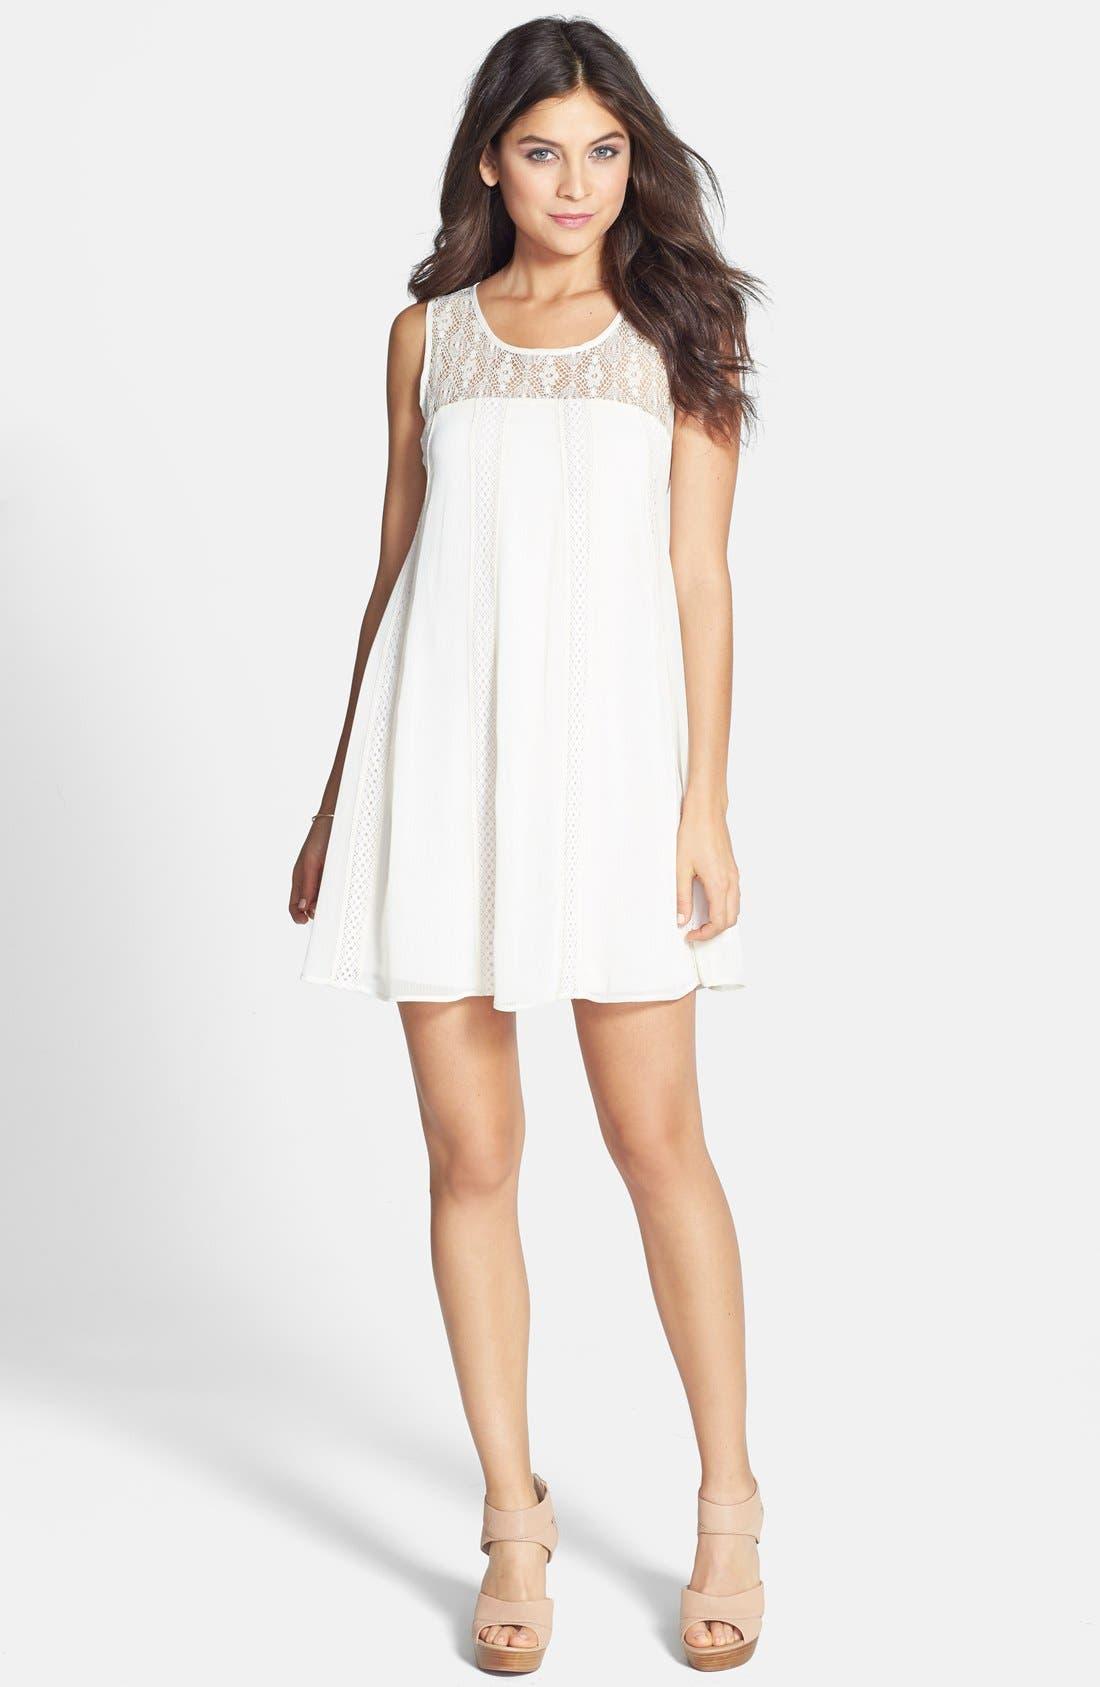 Alternate Image 1 Selected - Socialite Lace Panel A-Line Dress (Juniors)